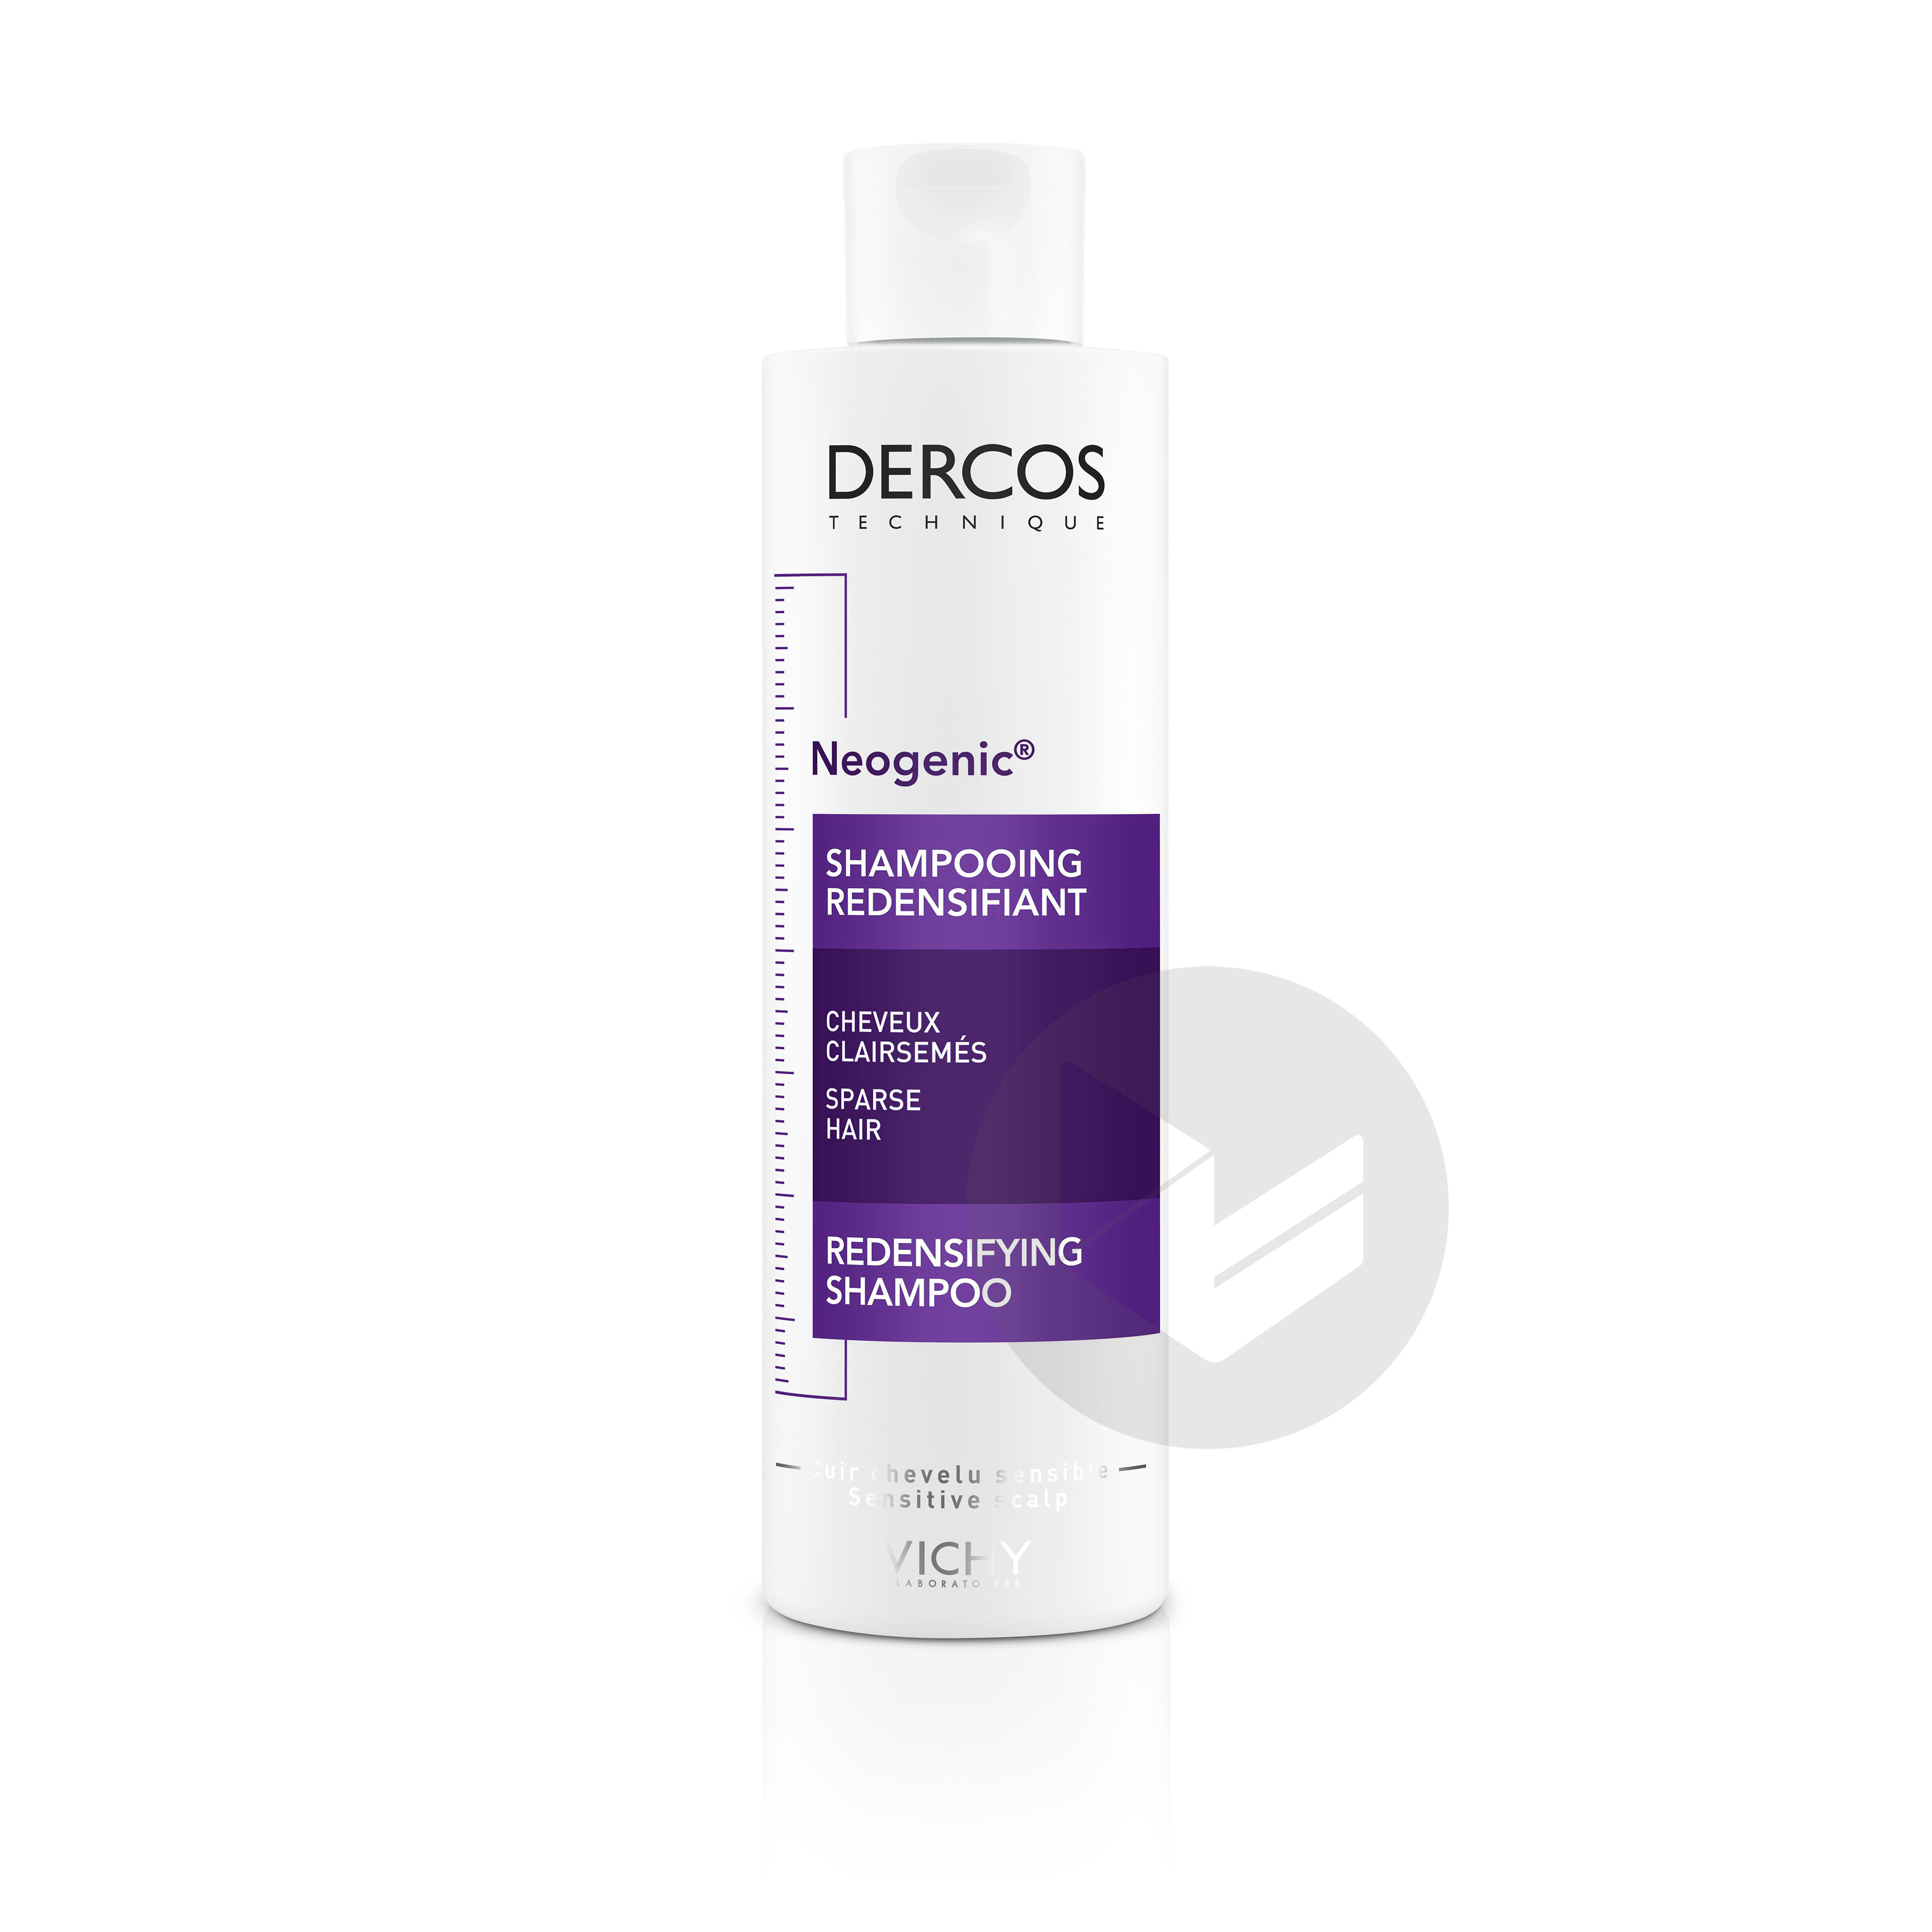 Dercos Technique Neogenic Shampooing Redensifiant